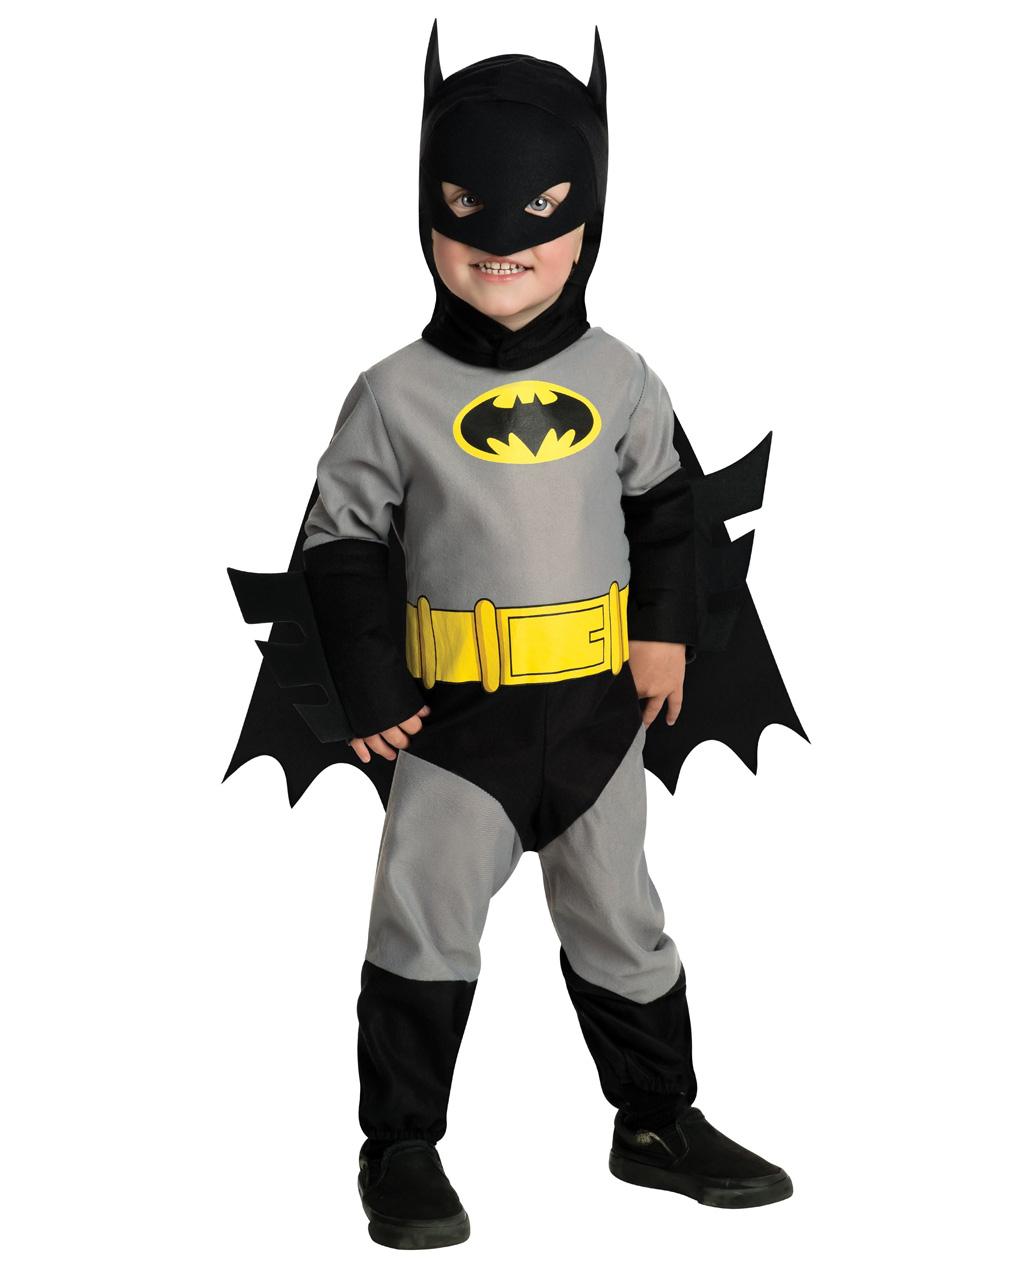 batman kost m f r kleinkinder als superhelden verkleidung karneval universe. Black Bedroom Furniture Sets. Home Design Ideas